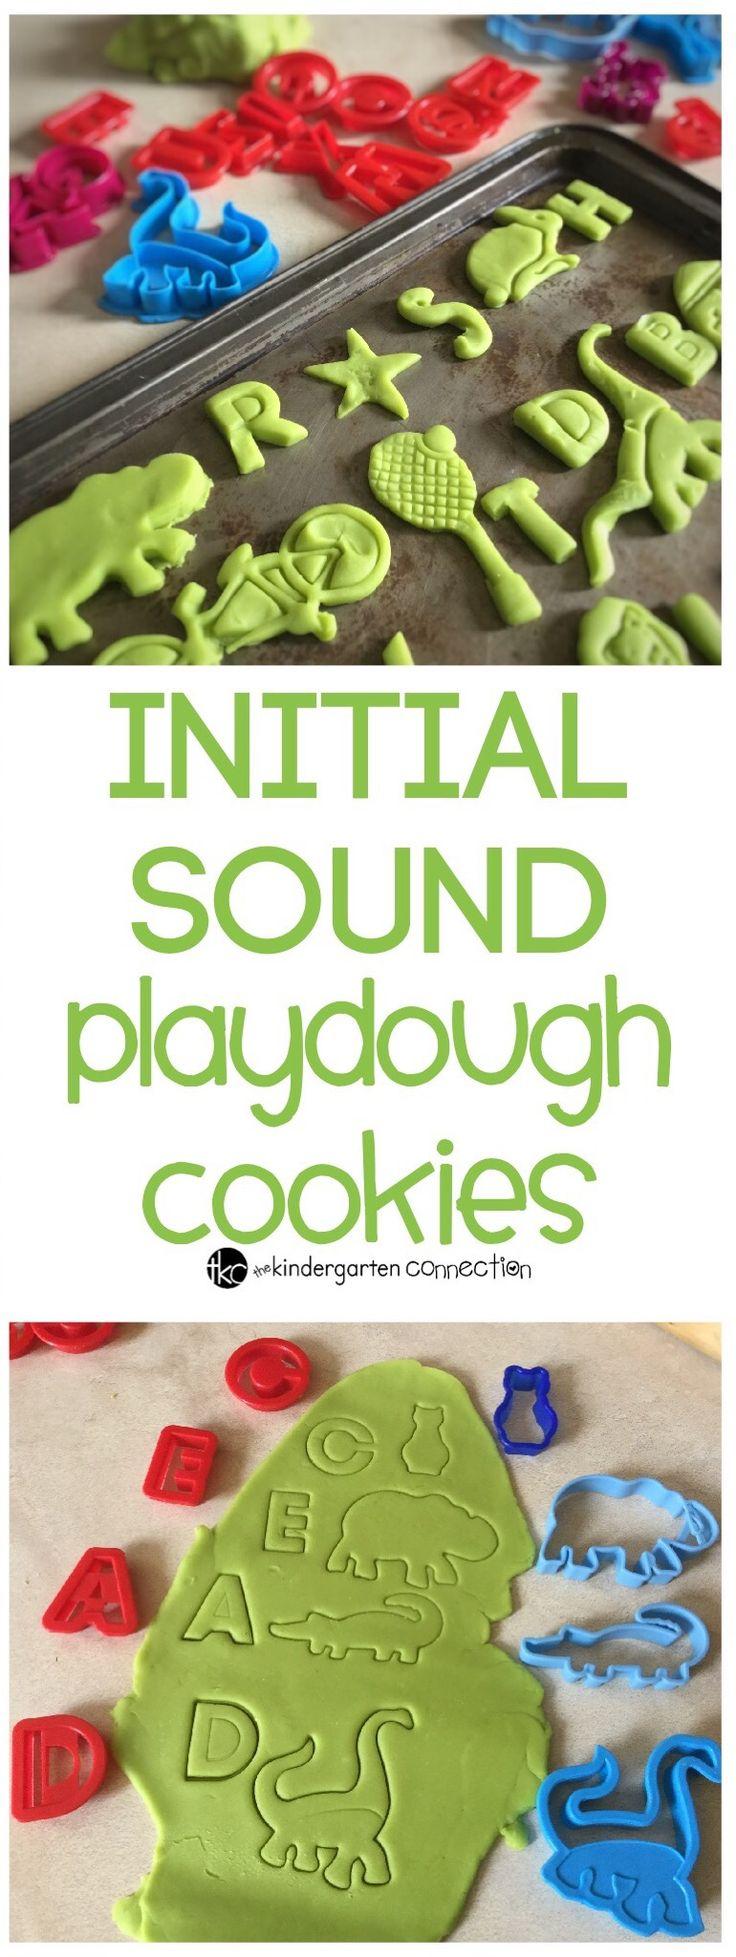 Initial sounds in playdough